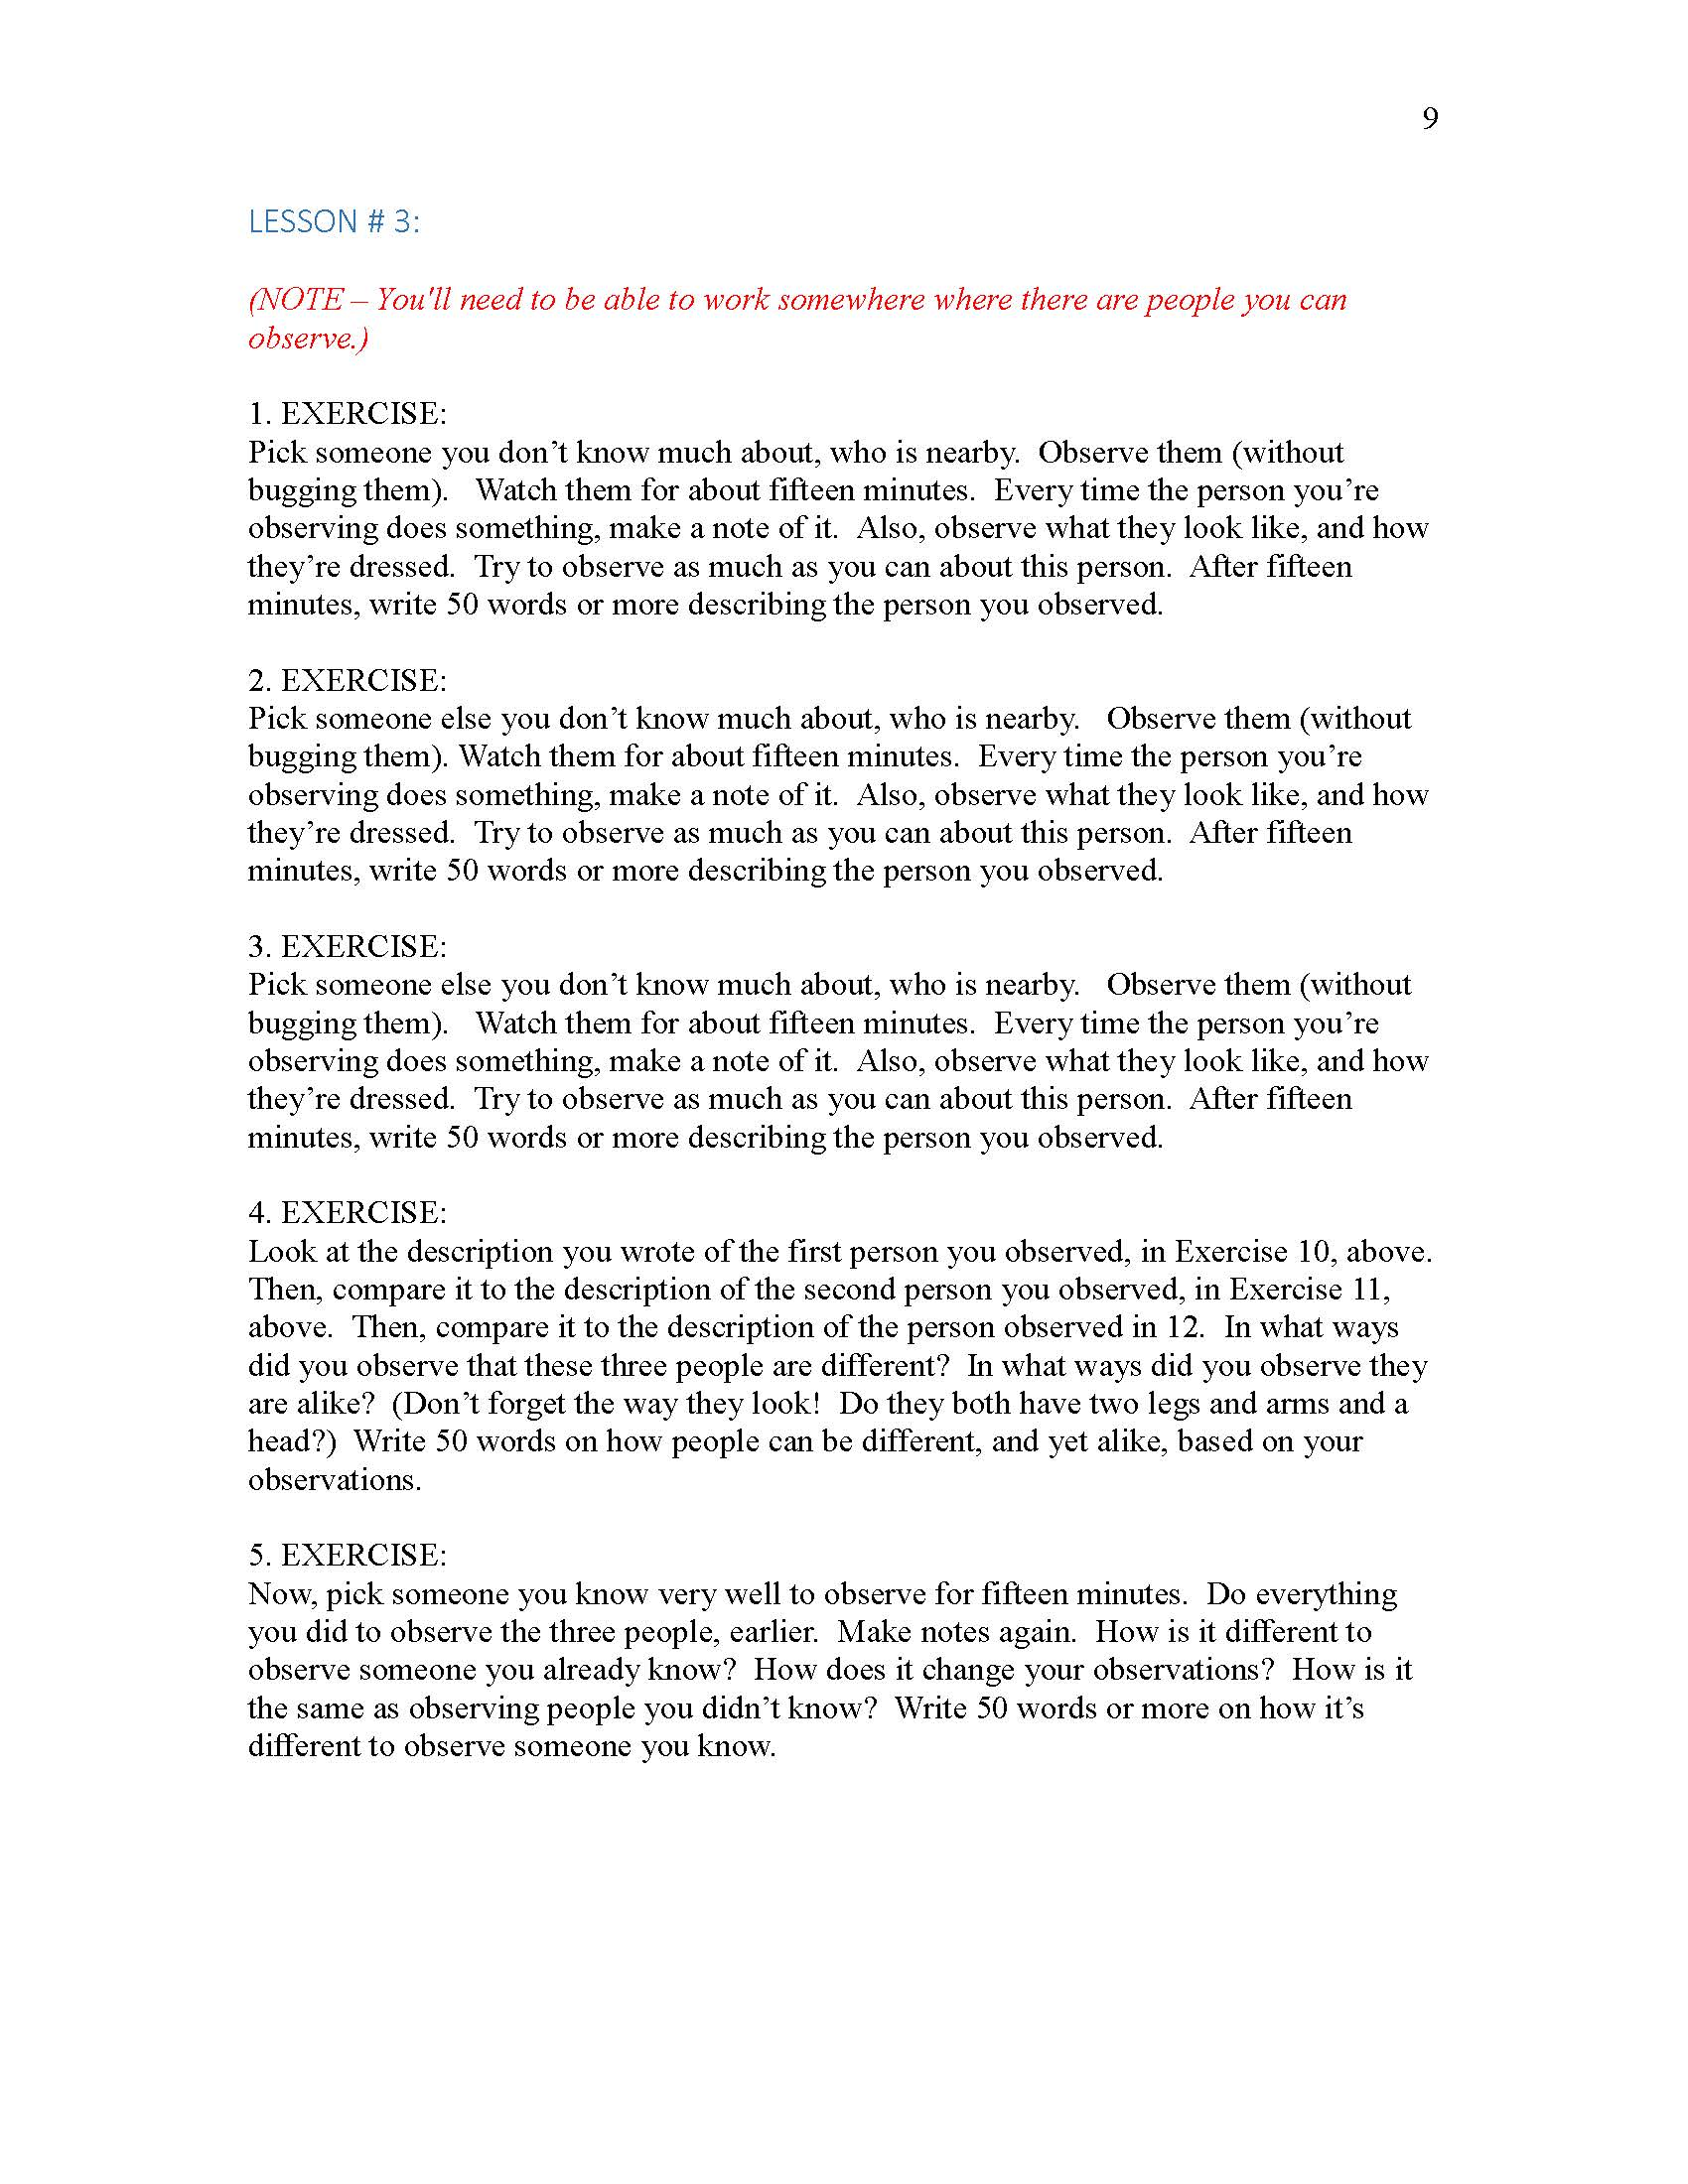 Step 4 Science 1 Science Basics_Page_10.jpg